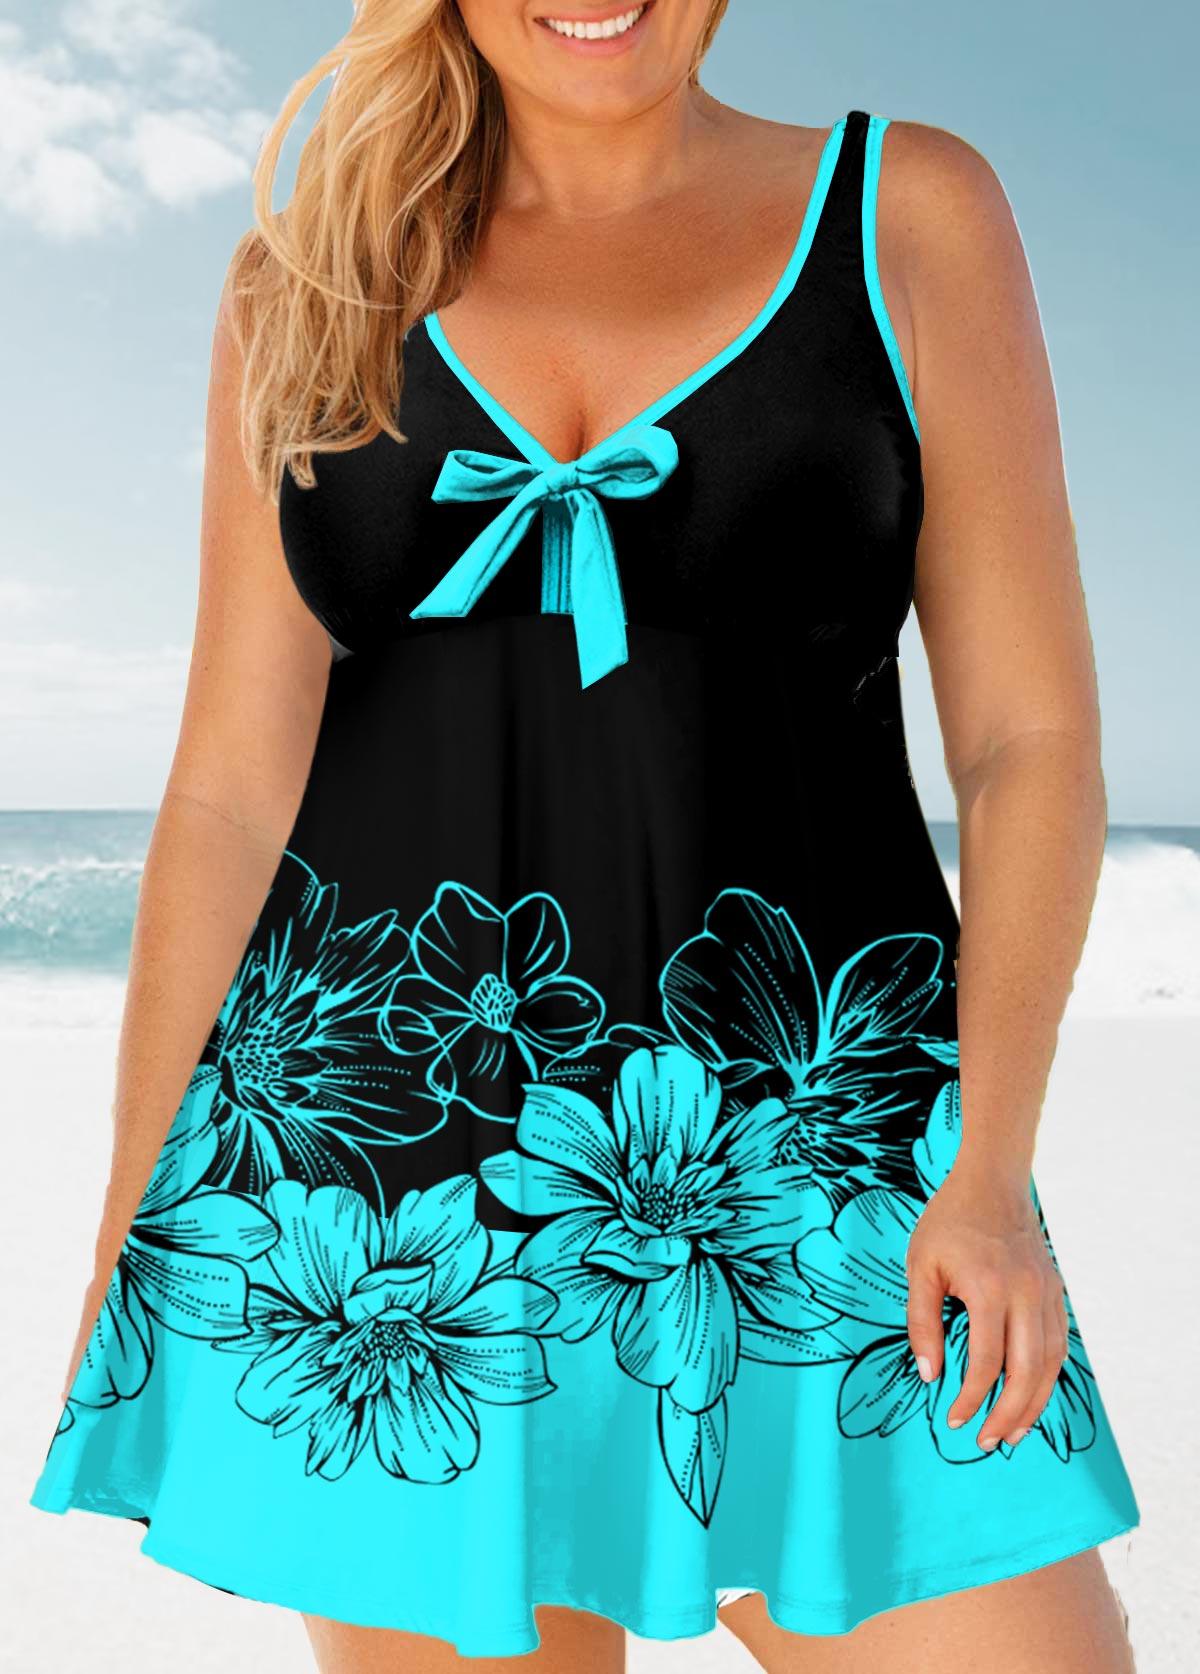 ROTITA Floral Print Plus Size Bowknot Swimwear Top